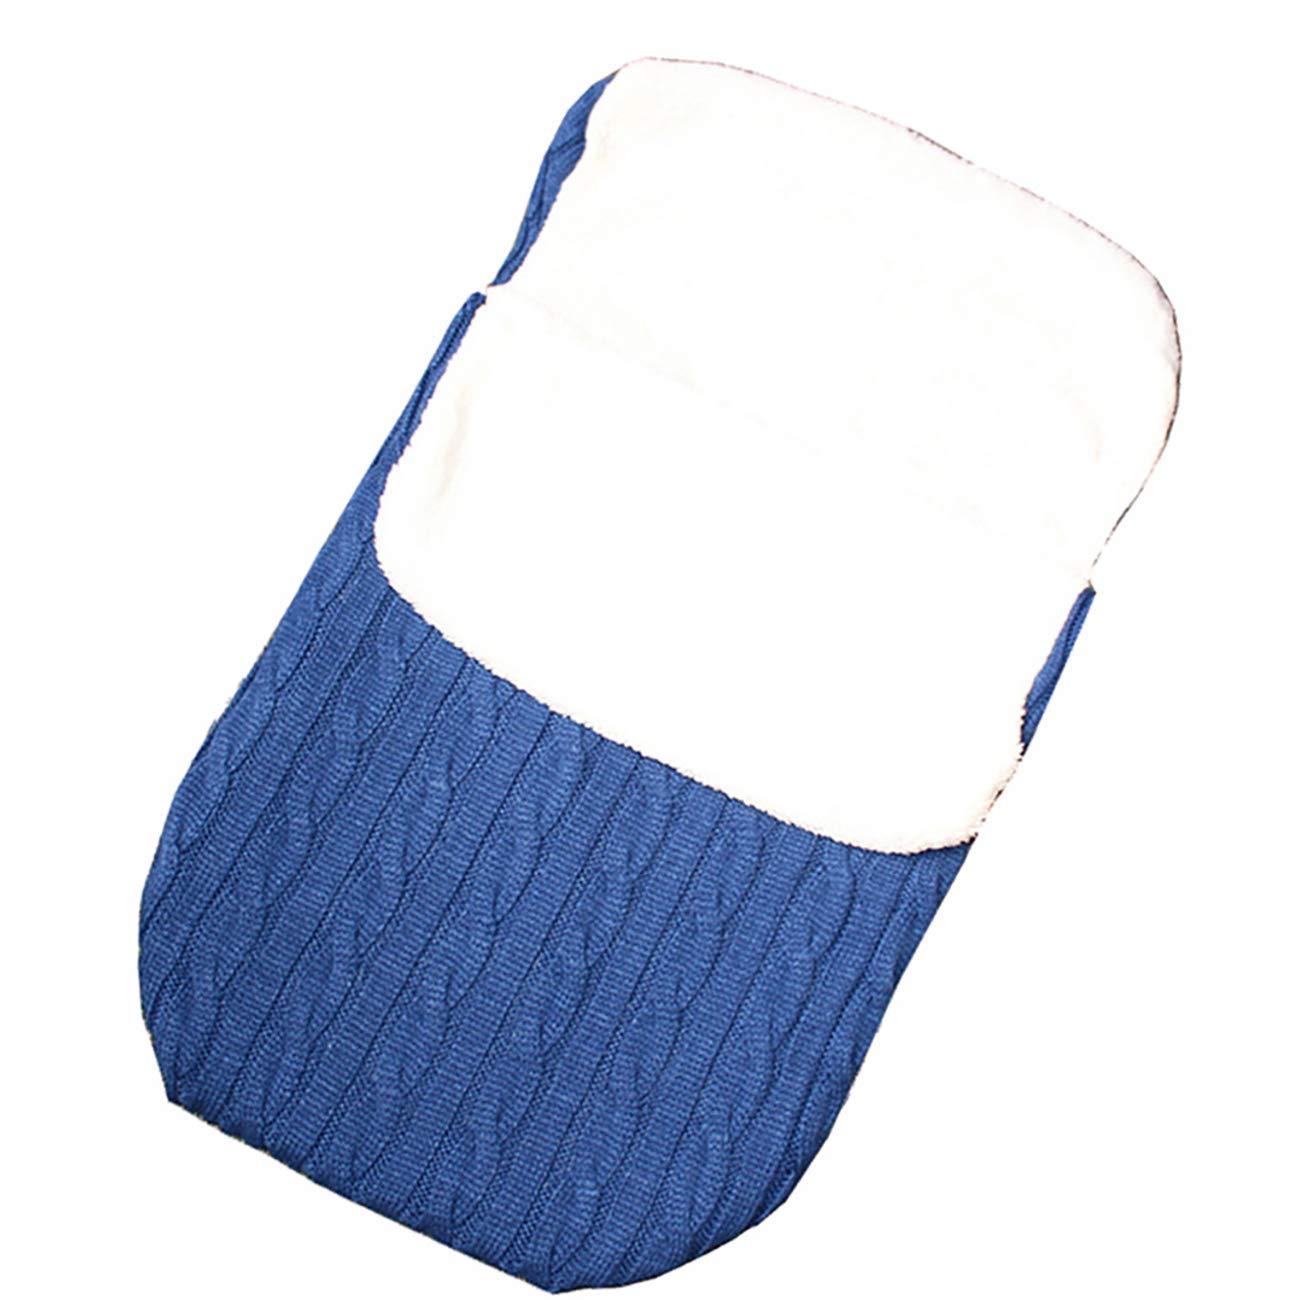 Uheng Newborn Baby Swaddle Blanket Wrap Kids Toddler Knit Soft Warm Fleece Infant Bunting Bag Sleeping Bag Sack Footmuff Stroller Unisex Wrap for 0-12 Month Boys Girls